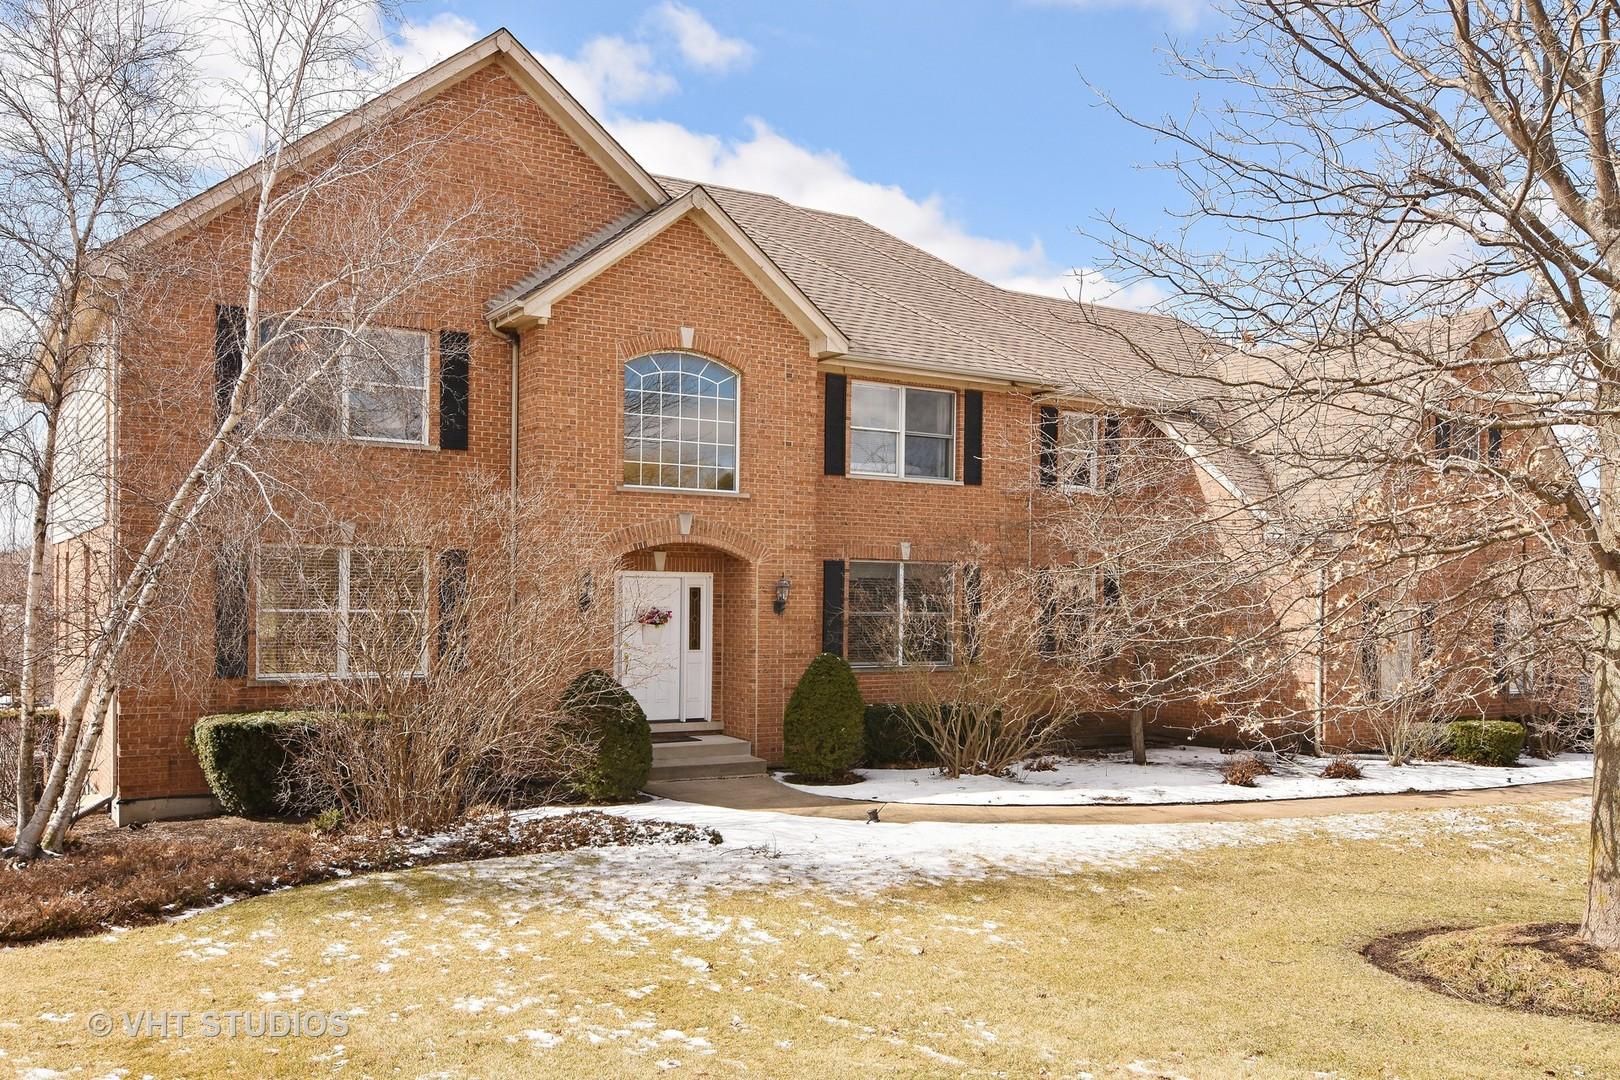 297 Joshua Drive, Hawthorn Woods, Illinois 60047